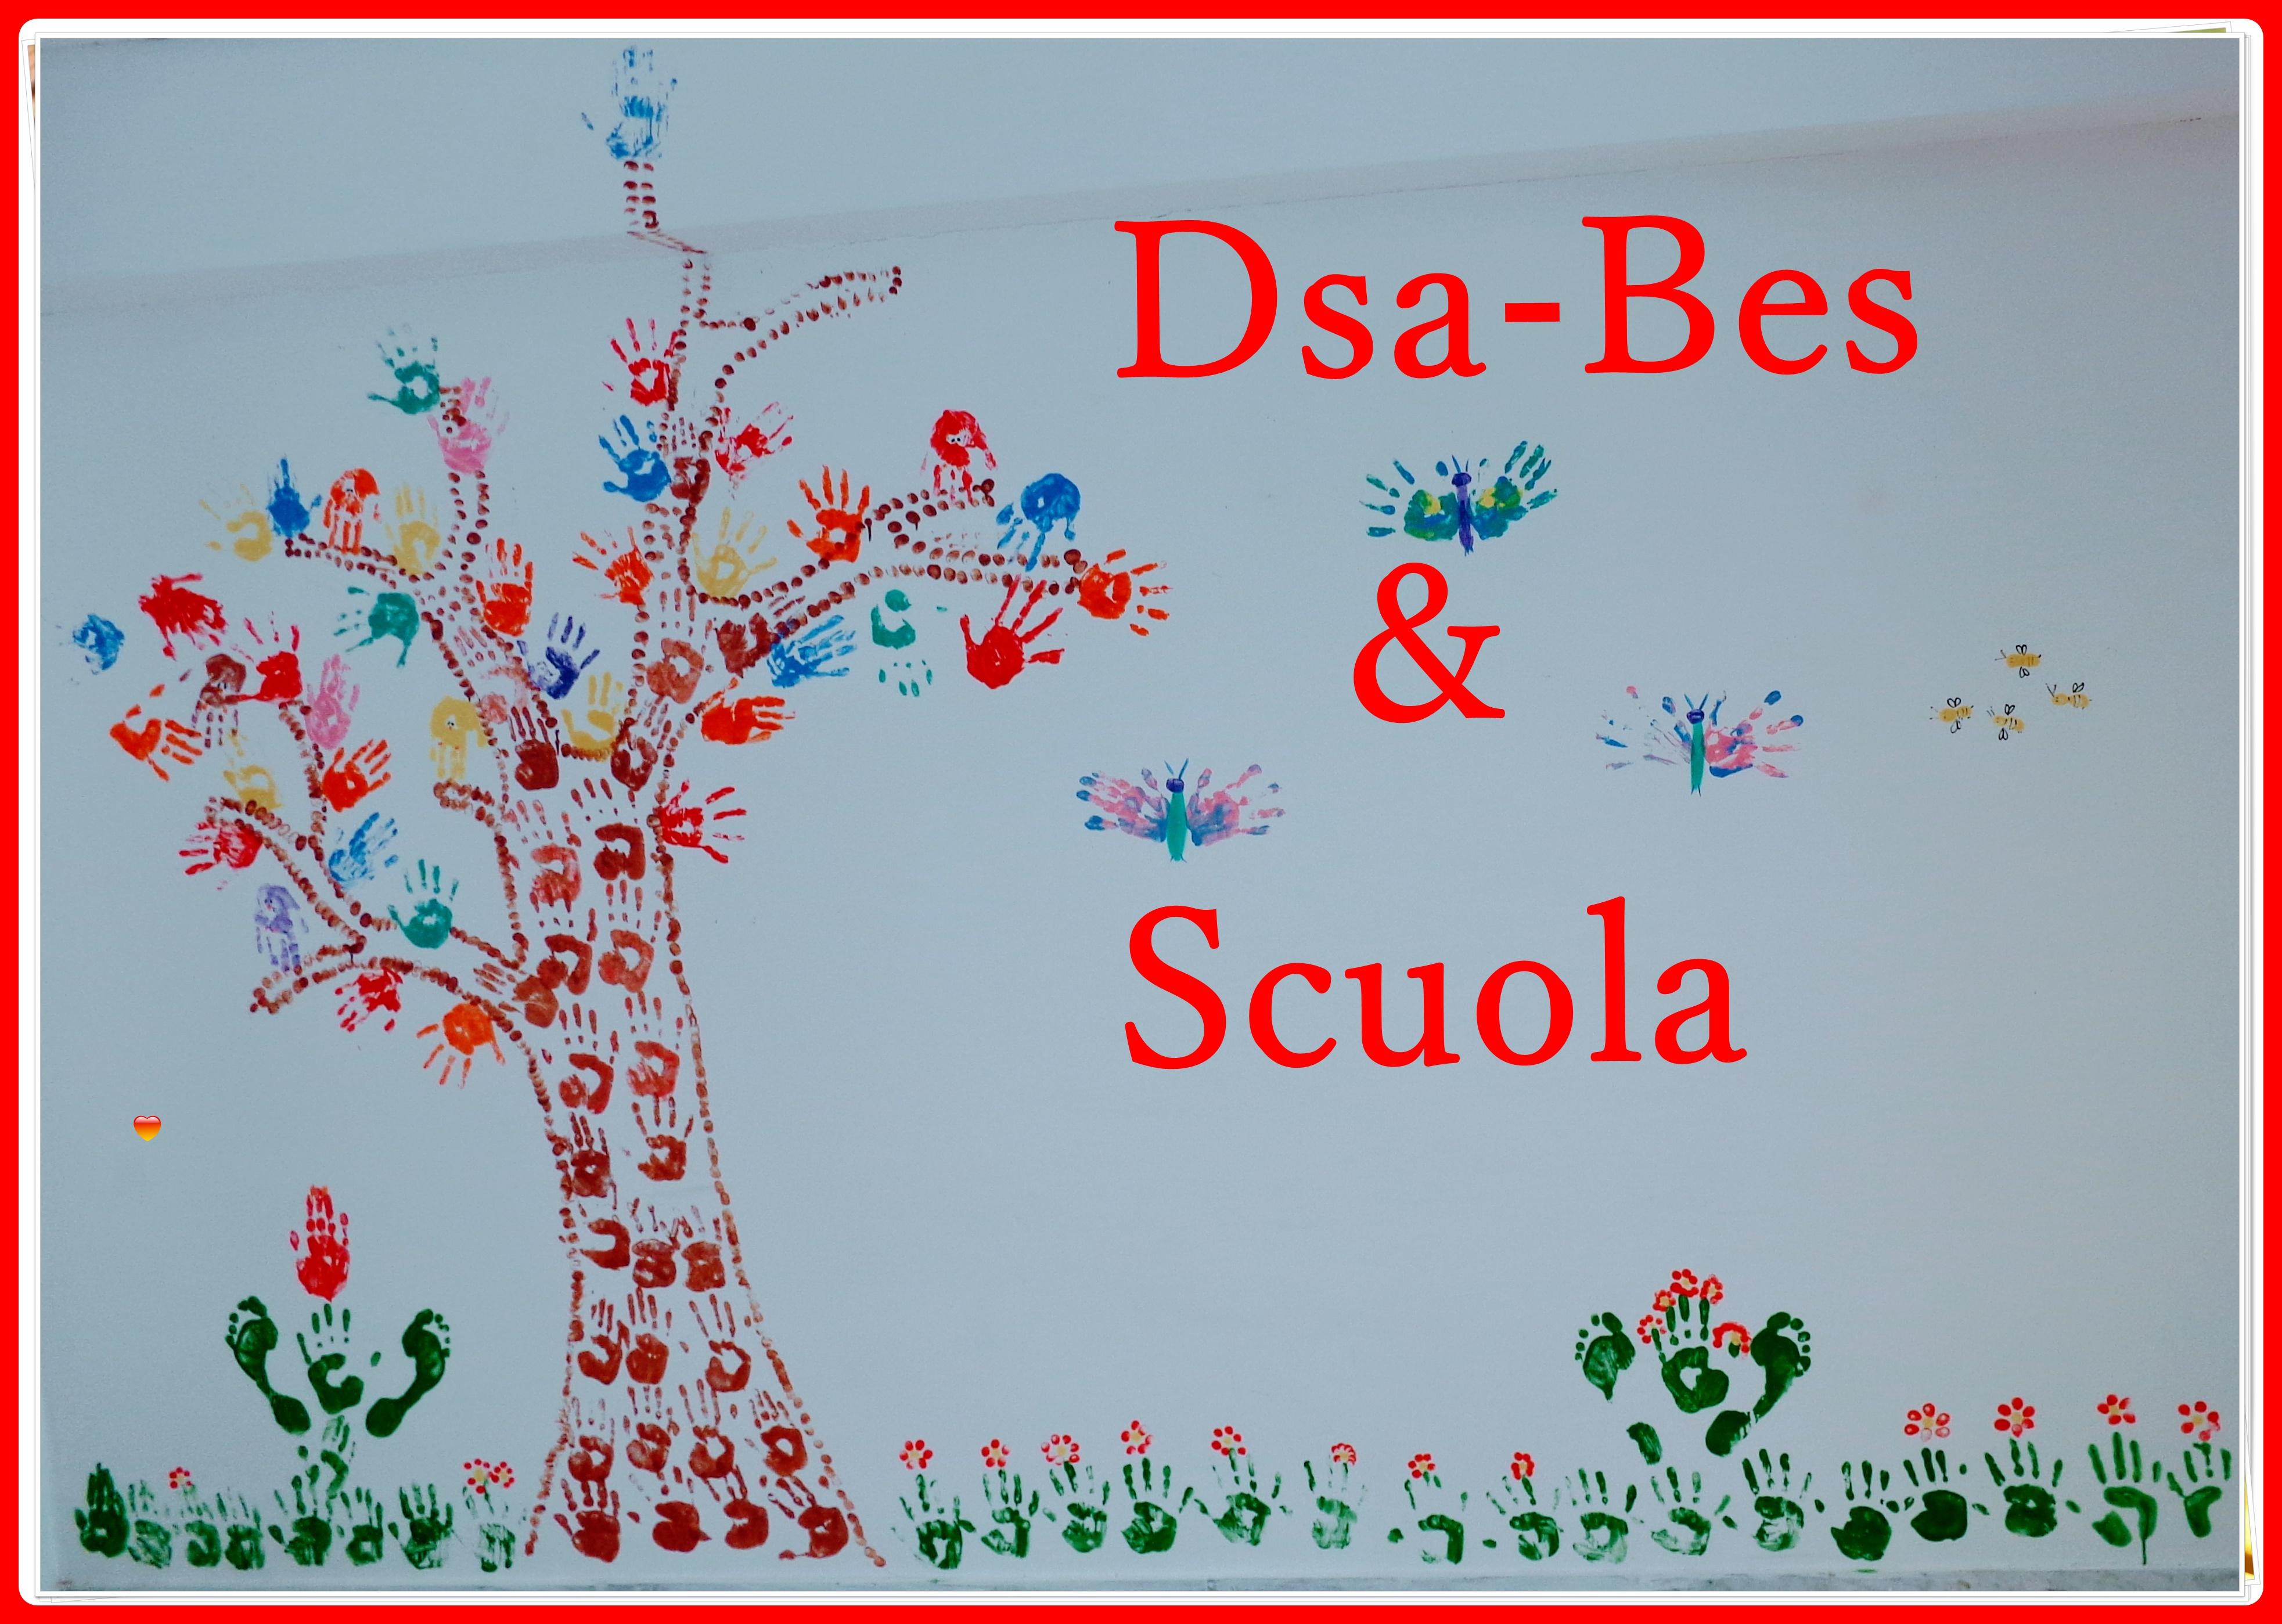 Dsa - Bes